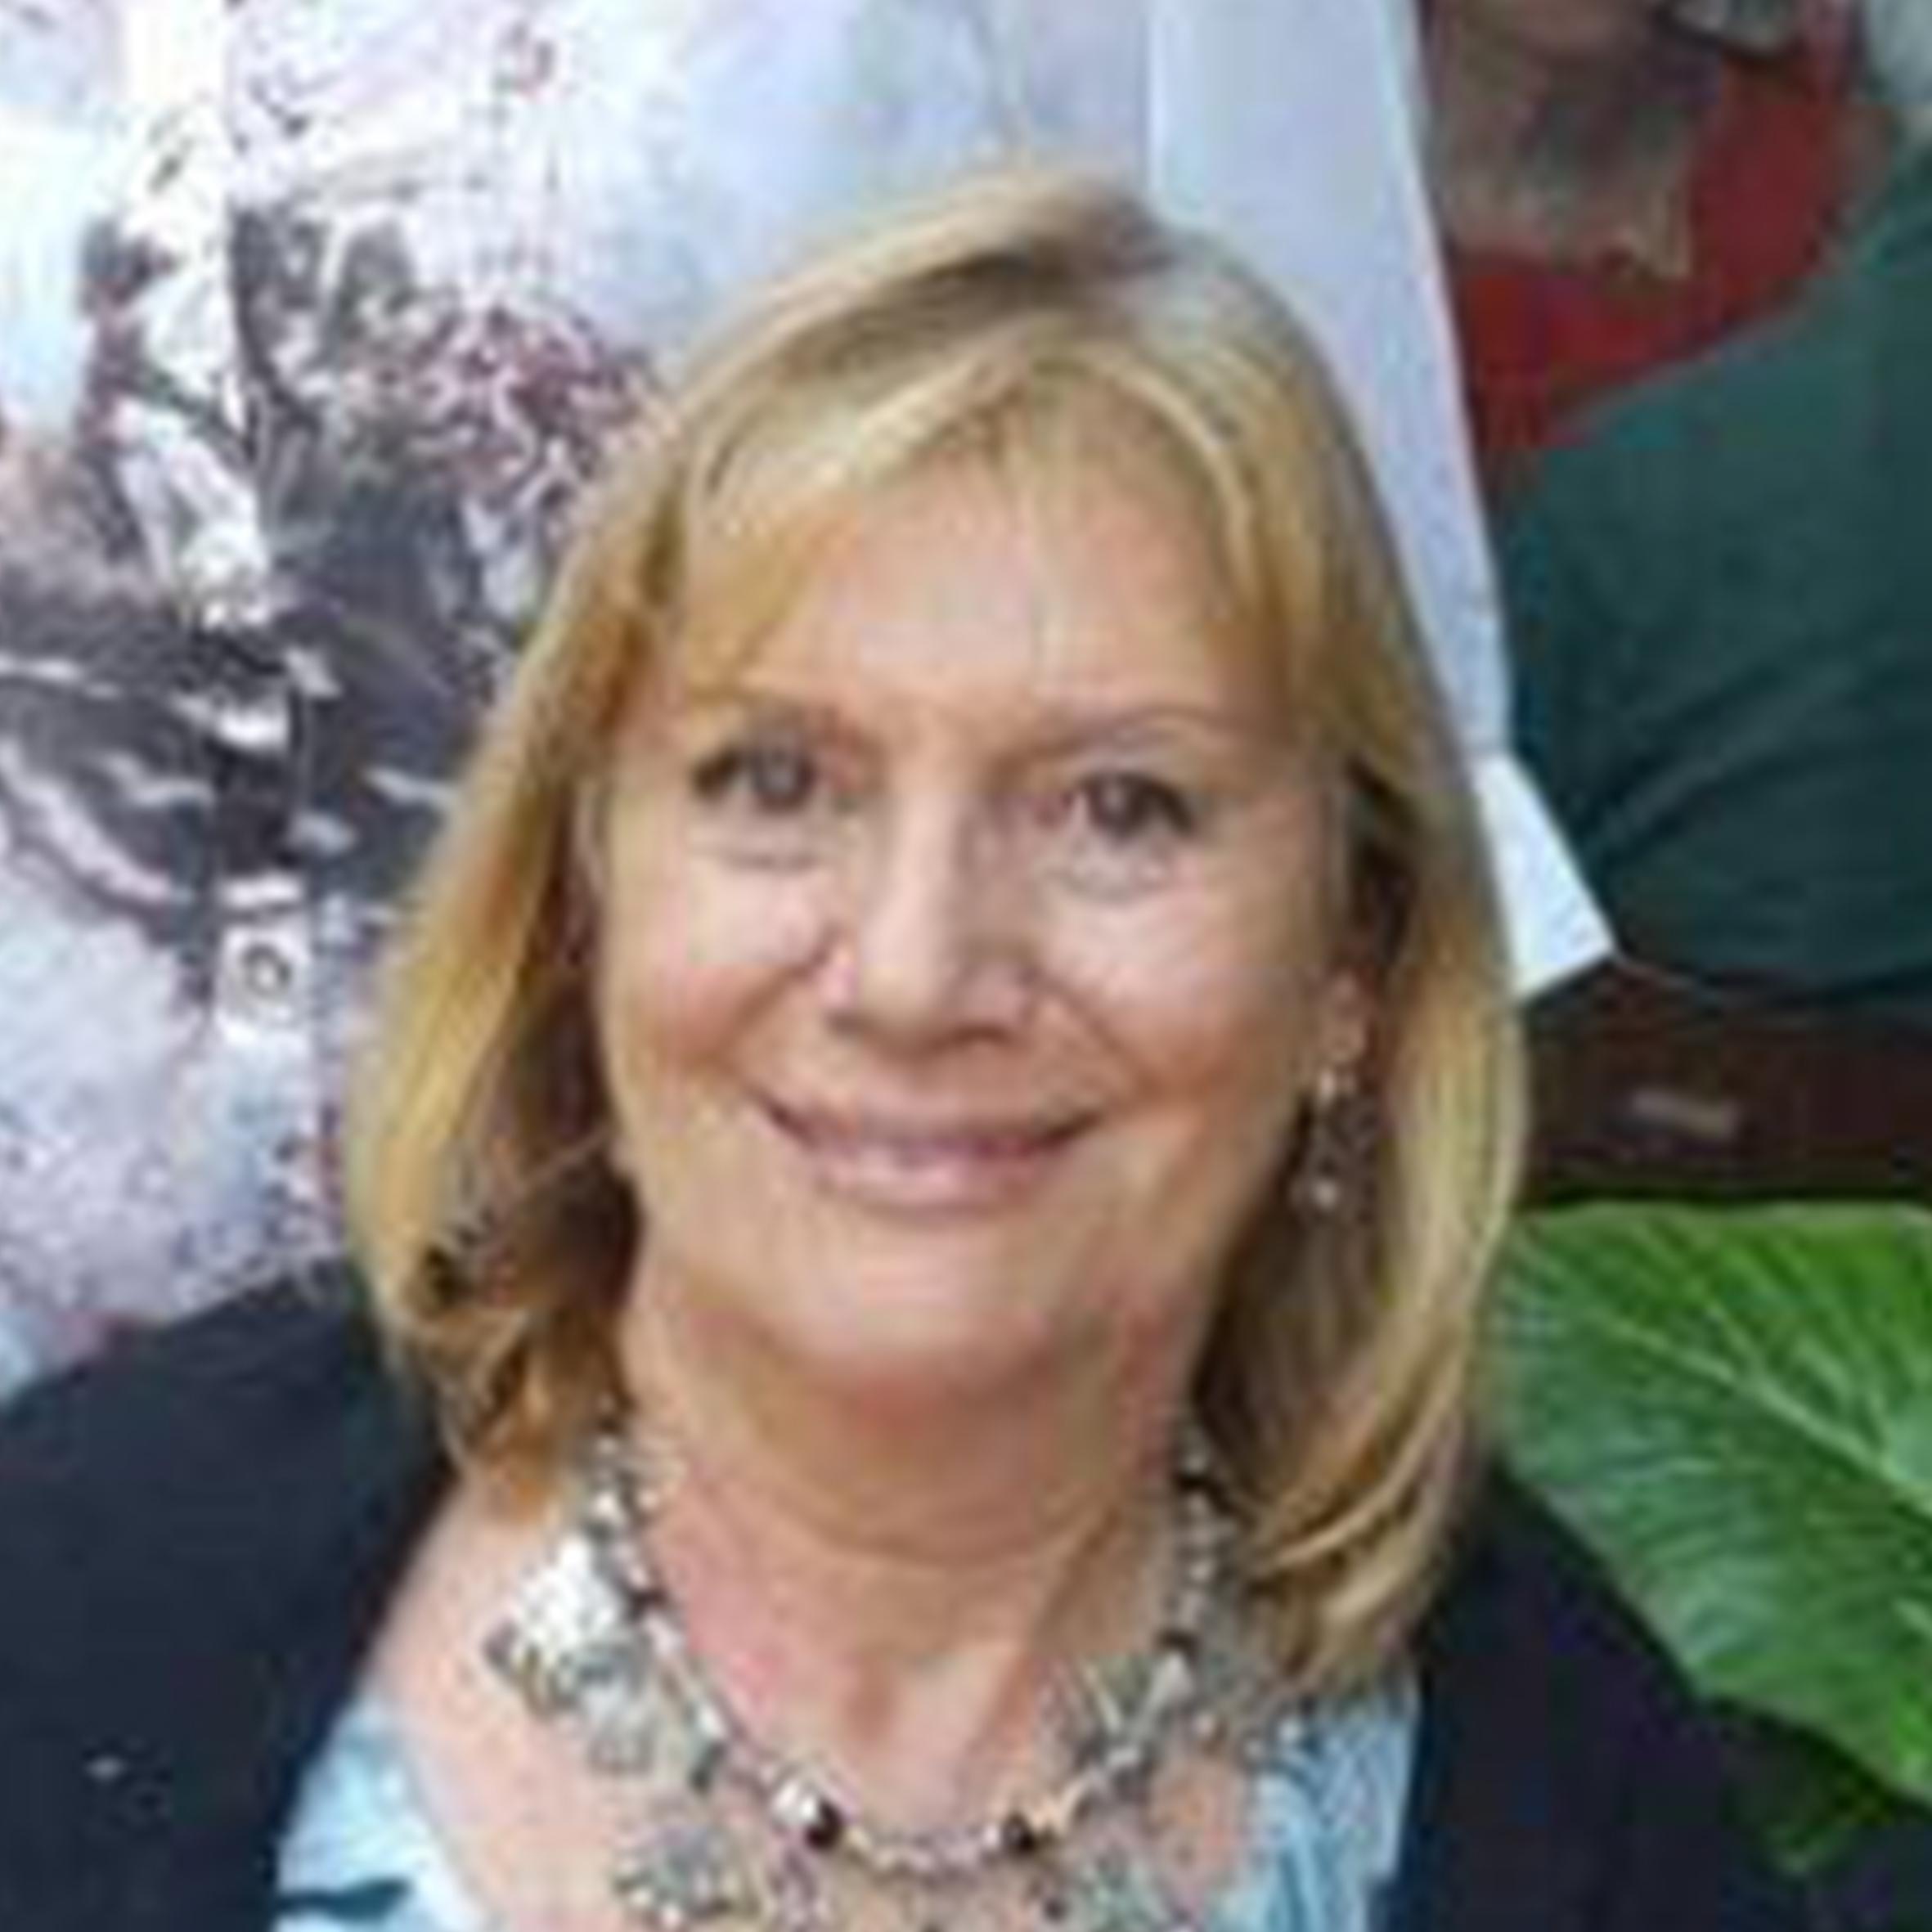 Monica Manley